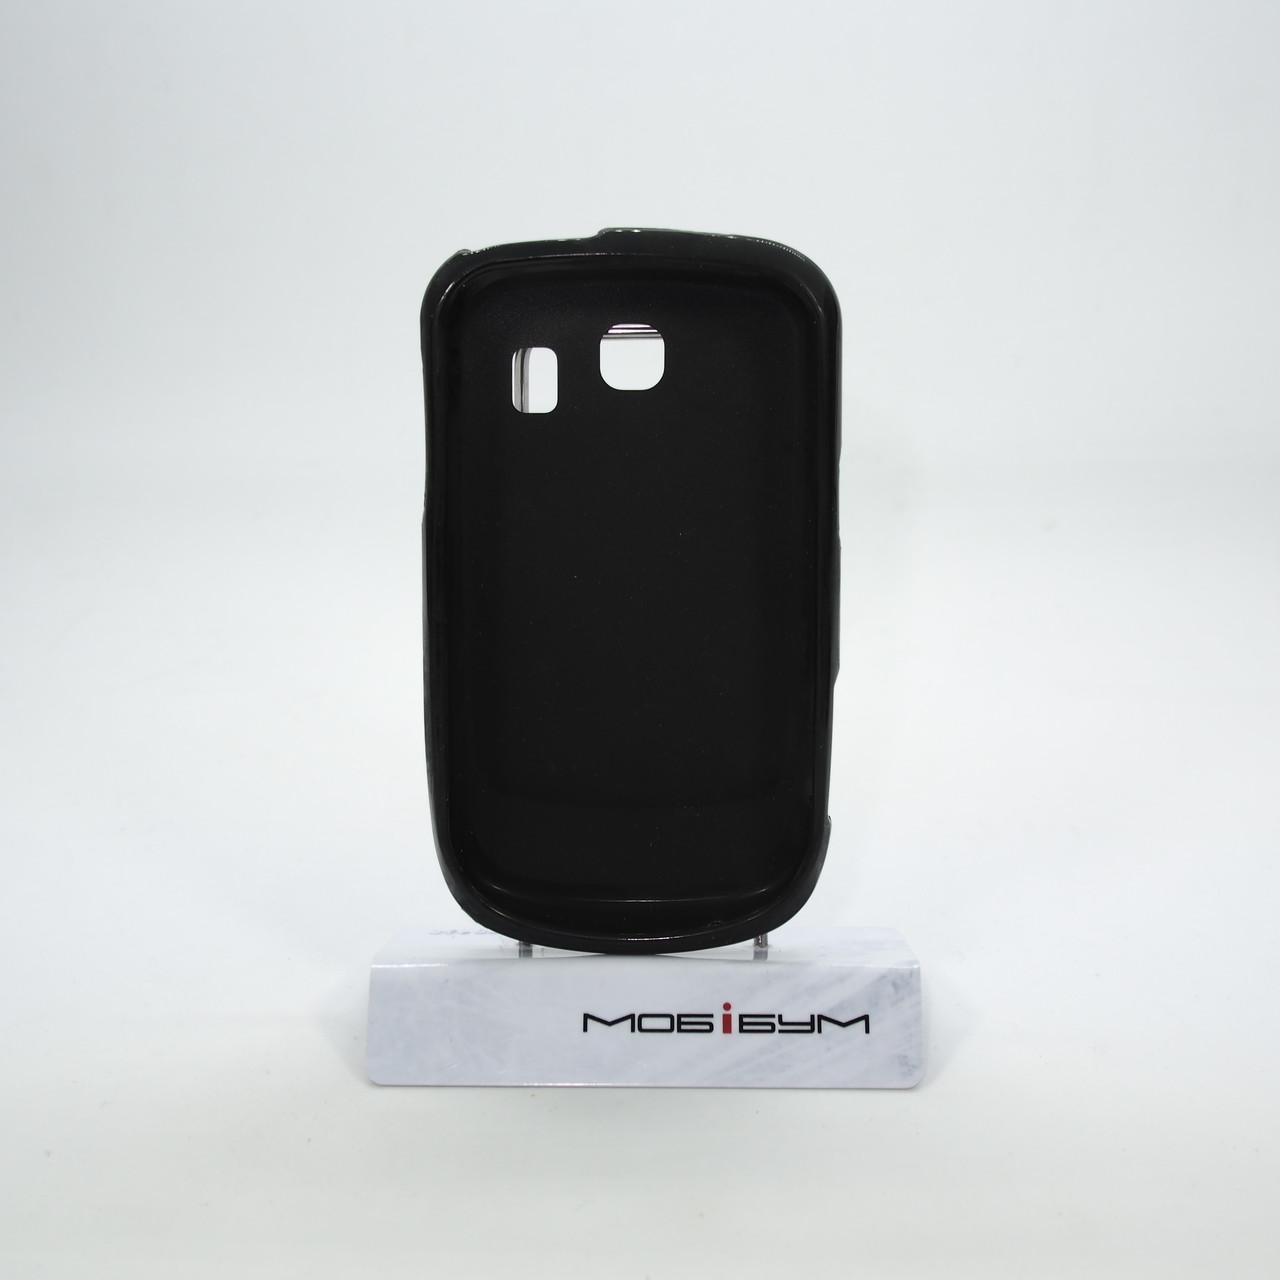 Чехол Silicon Best Samsung S3850 black Galaxy Corby II (S3850) Для телефона